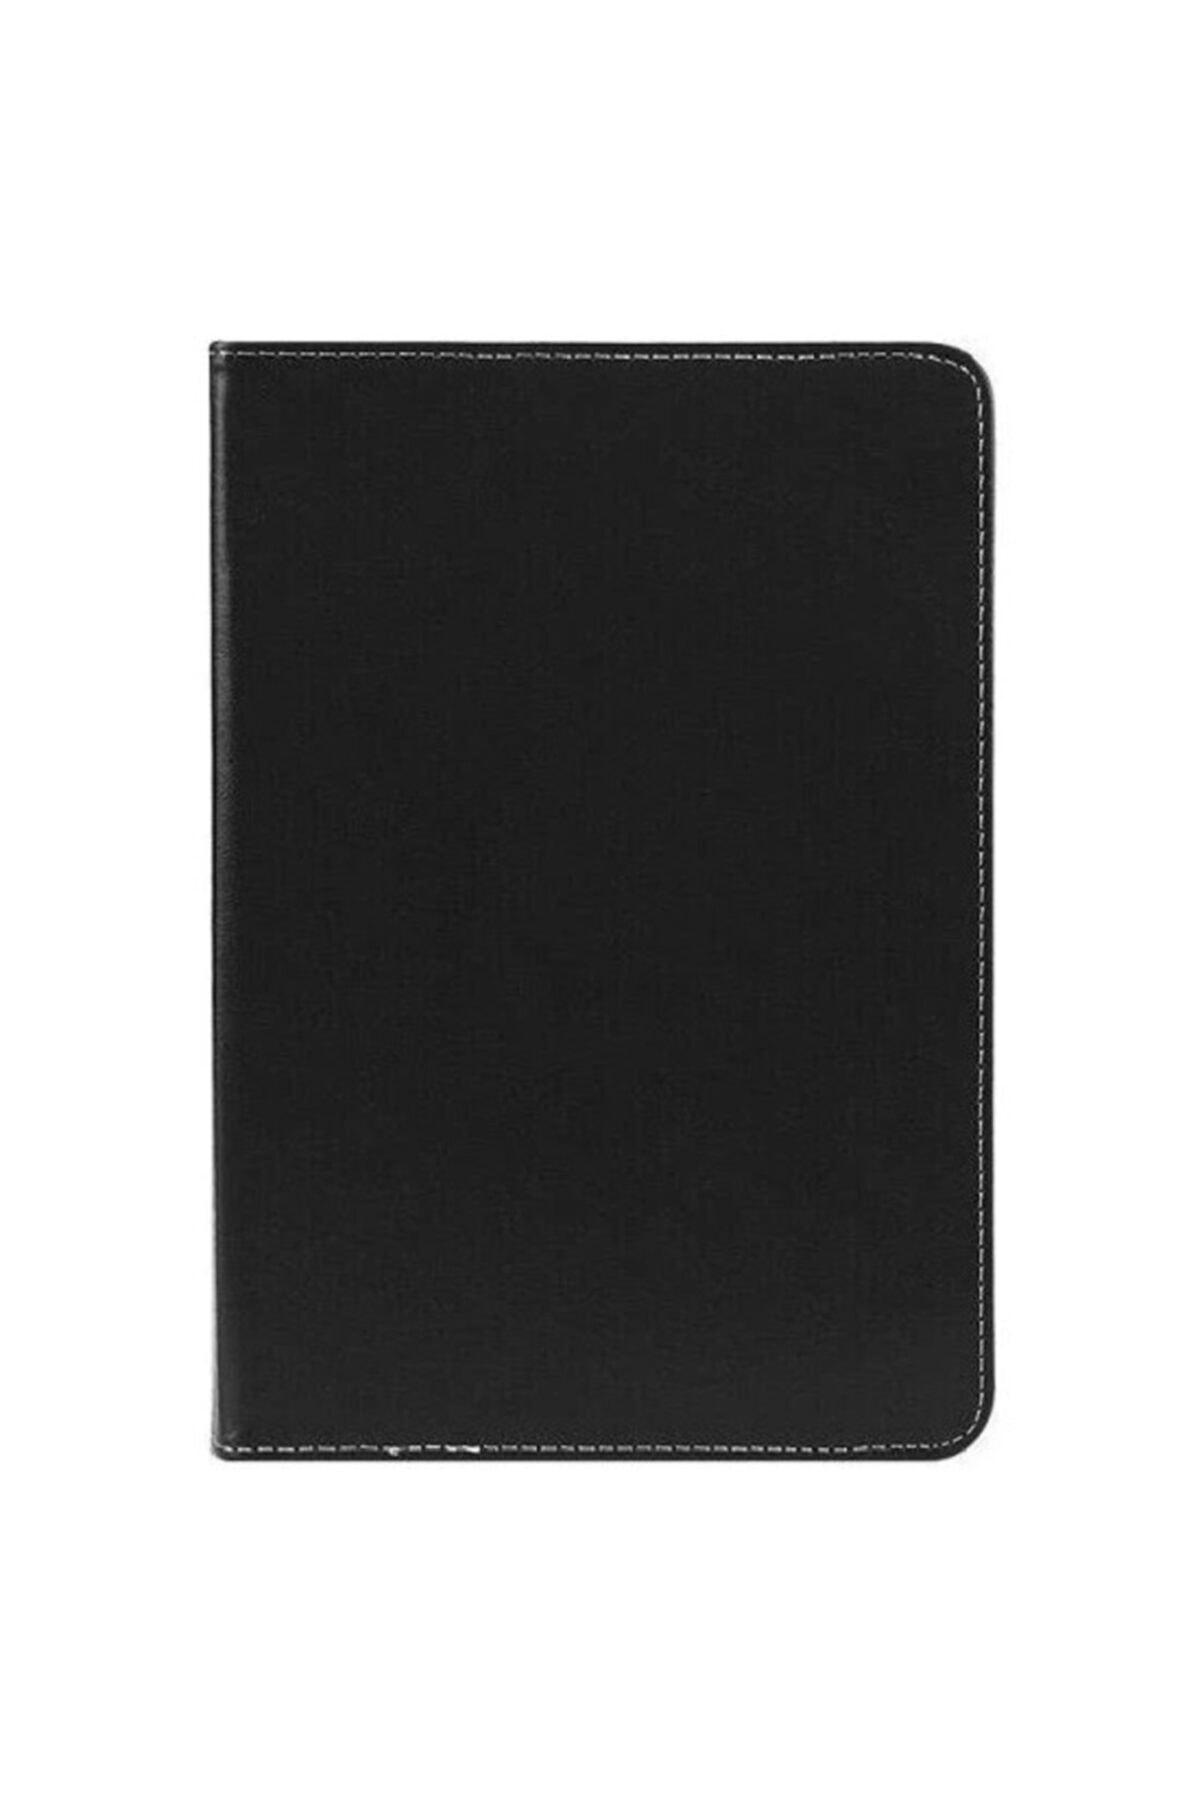 "Atlas Samsung Galaxy Tab A 8.0"" T290/295/297 360 Derece Döner Tablet Kılıf"